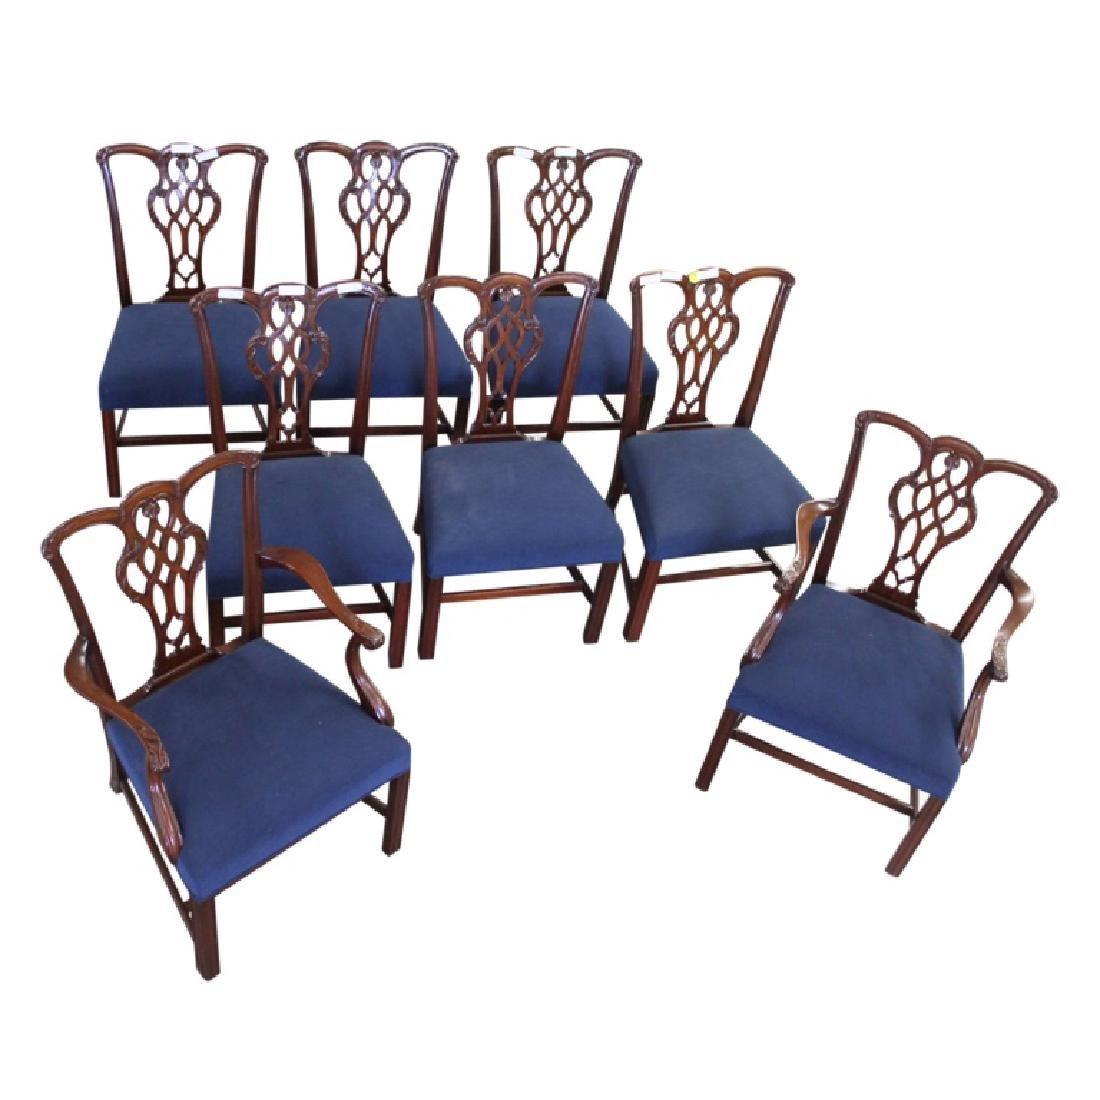 Schmieg & Kotztan Dining Chairs - 8 PCS - 2